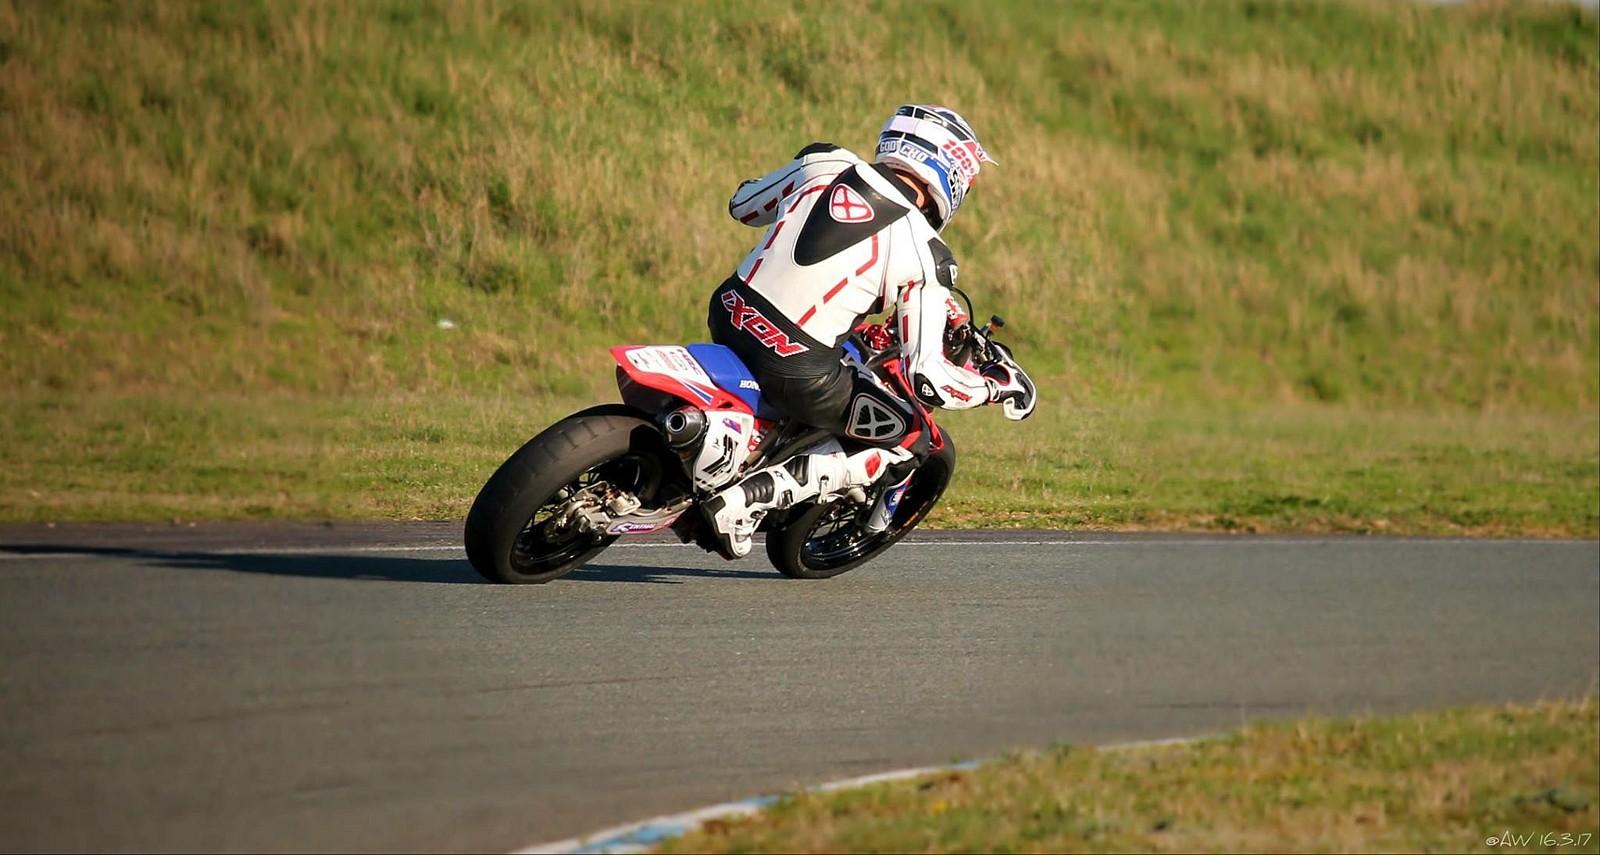 D861DB0A-2368-46D9-8759-6DBC6F7A6BB3 - Godcho - Motocross Pictures - Vital MX